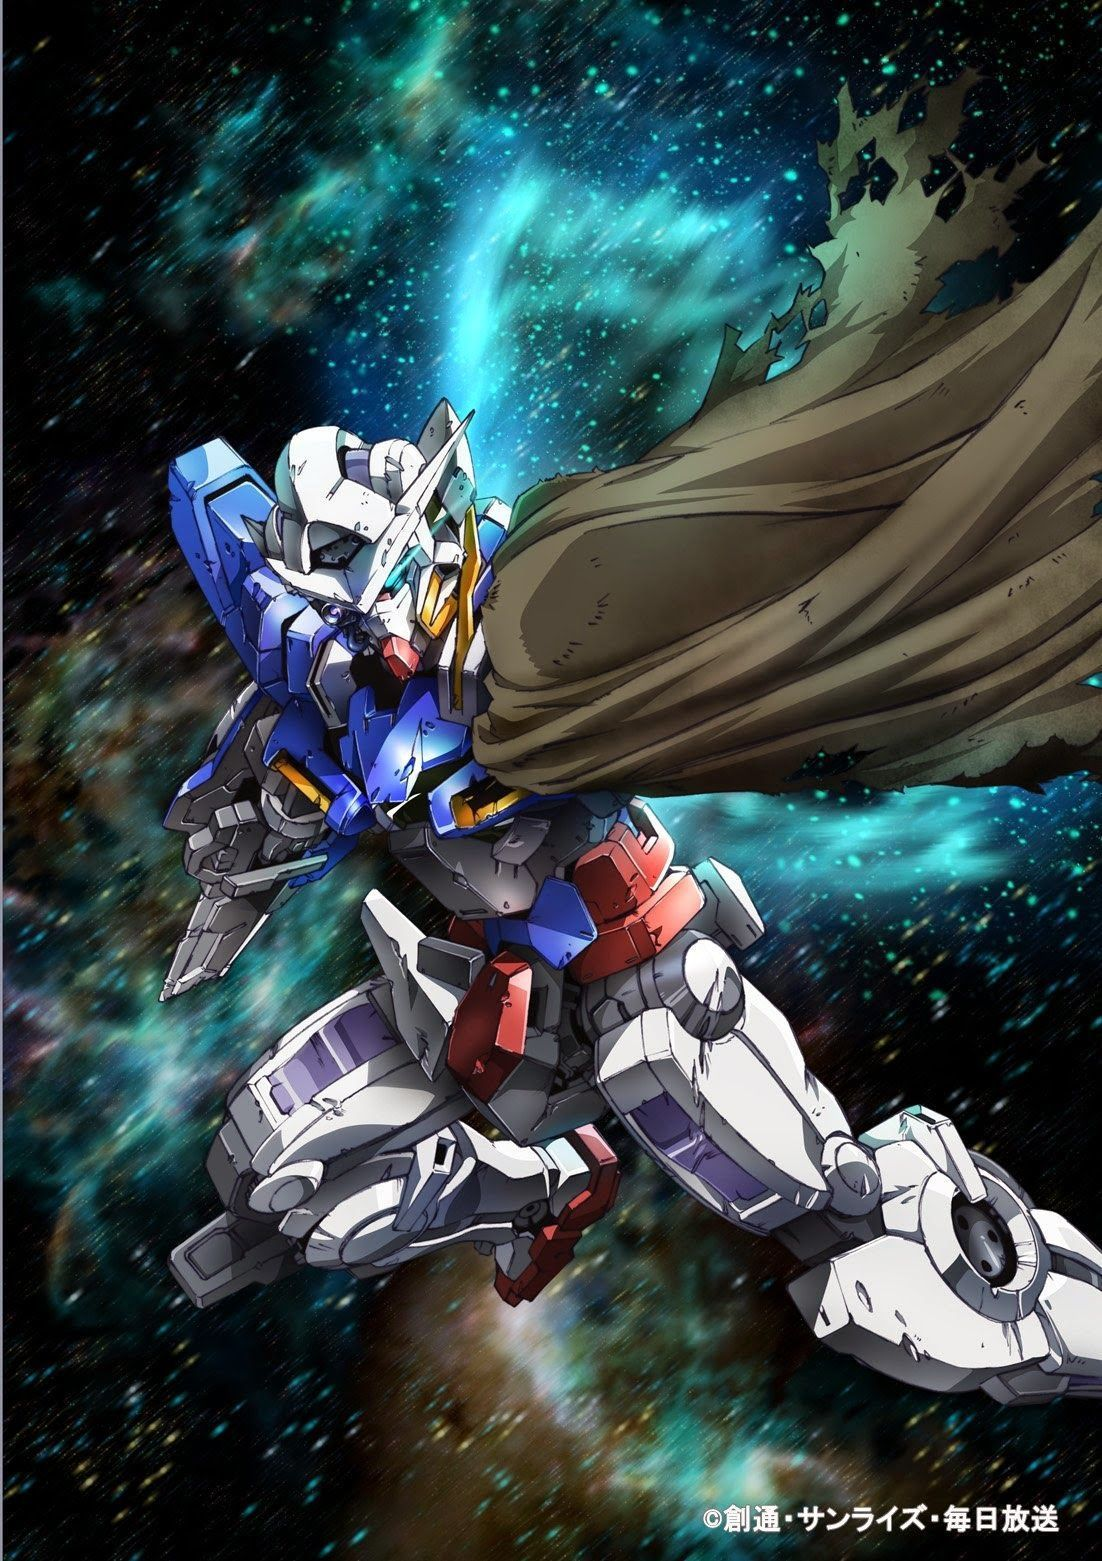 Gundam Exia Wallpapers Wallpaper Cave Гандаму